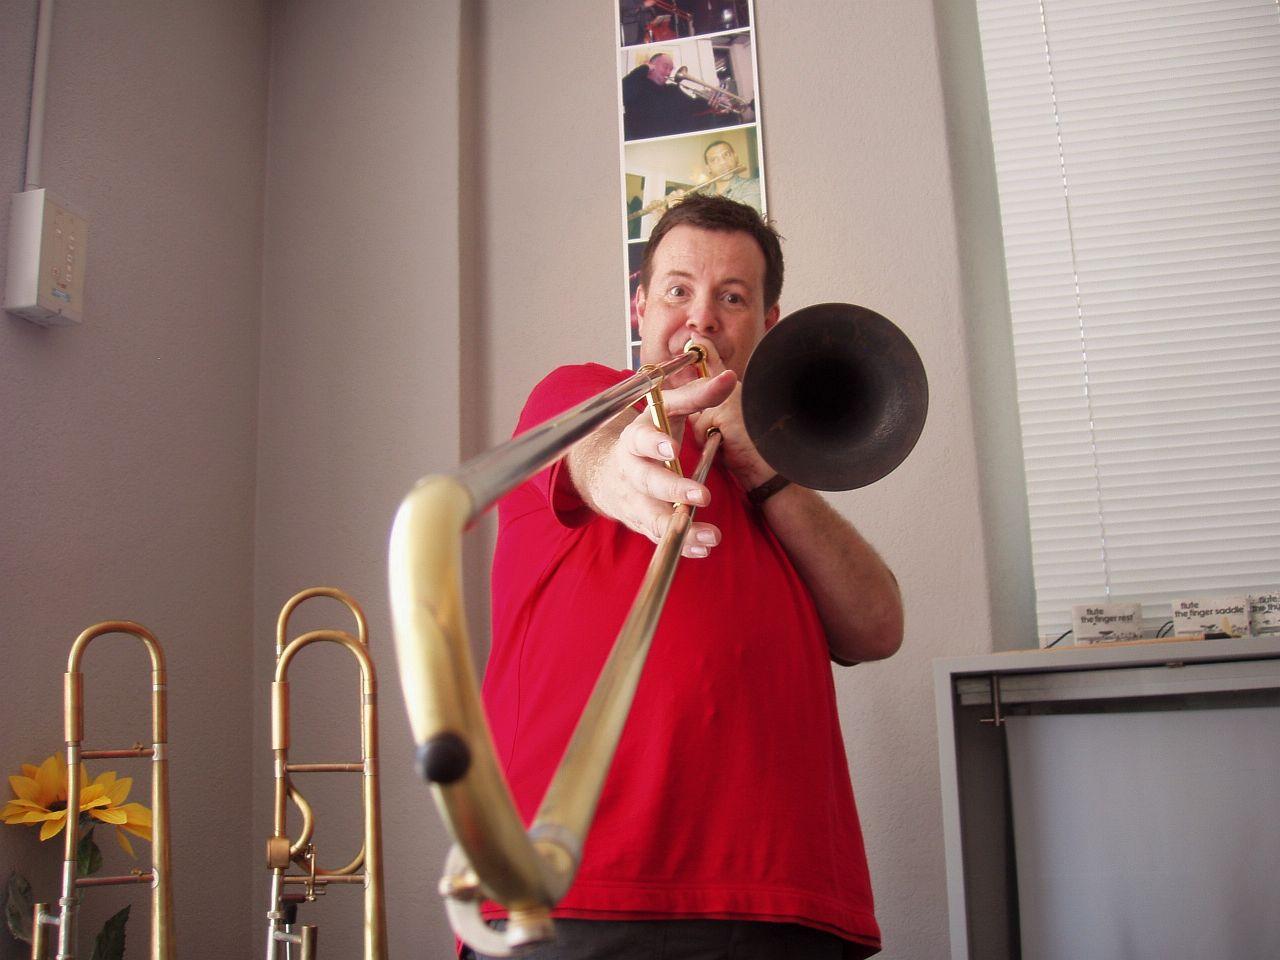 Musiker 284